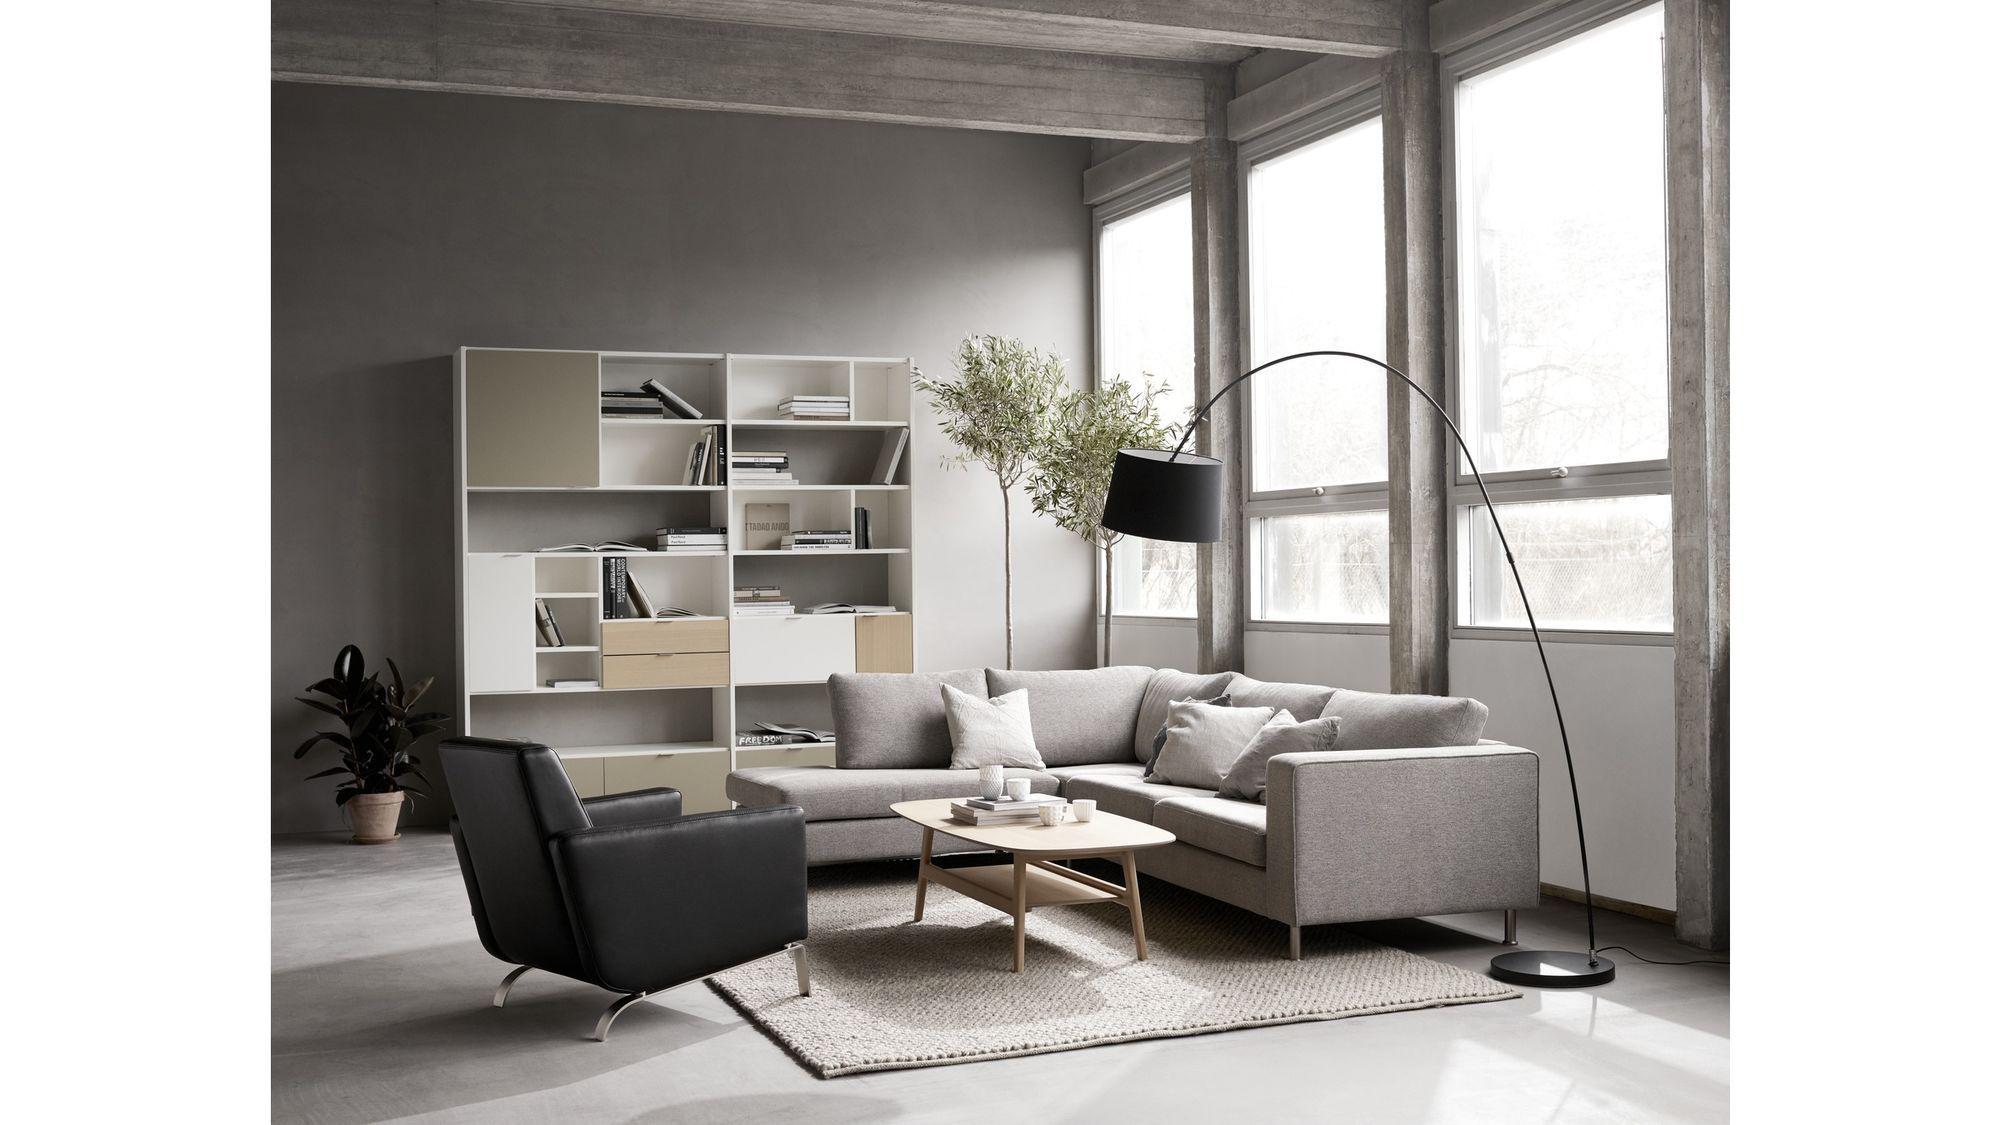 Lamps Kuta Floor Lamp Bookcase Design Scandinavian Furniture Design Furniture Design